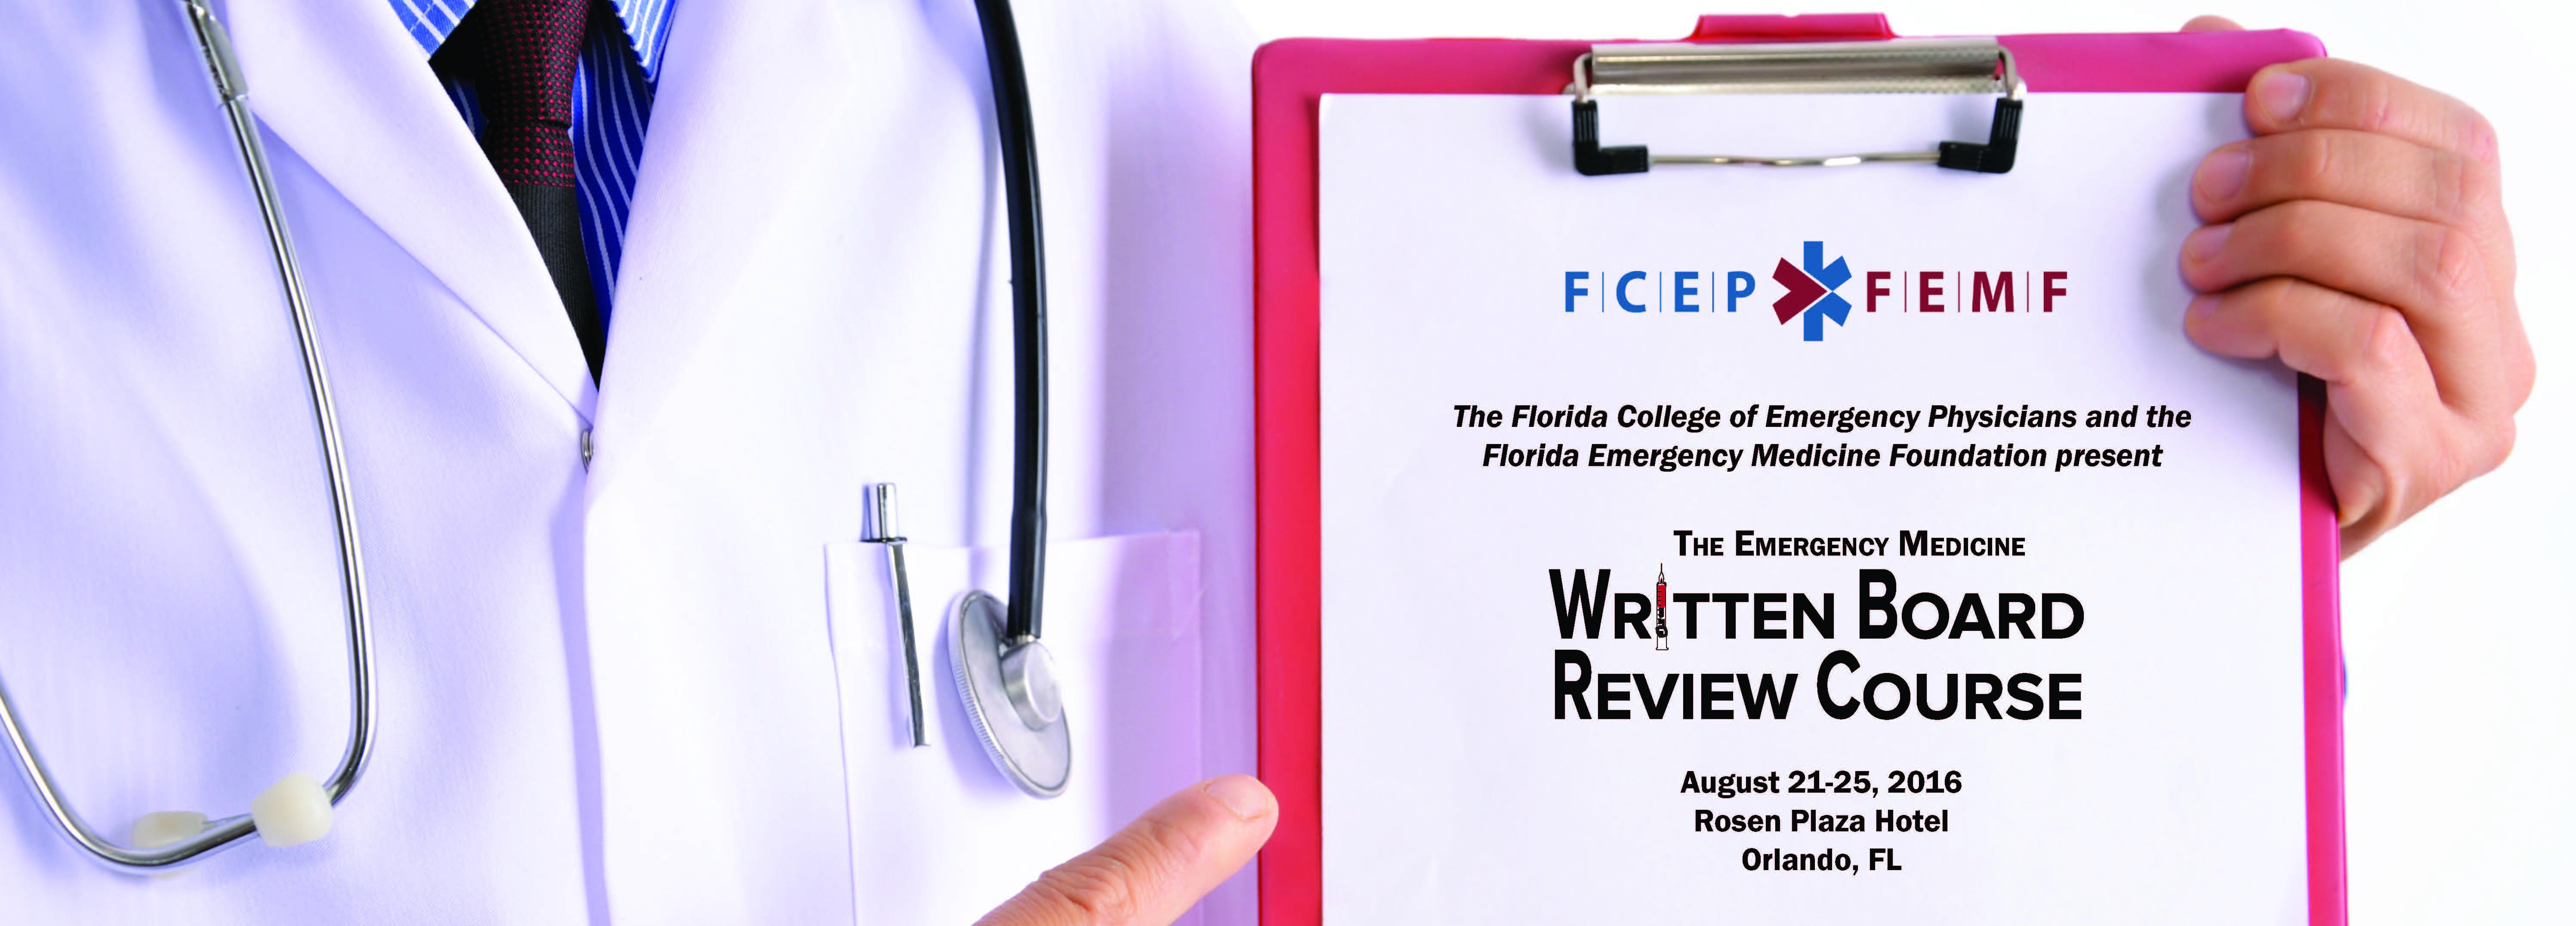 Florida's Emergency Medicine Written Board Review Course 2016